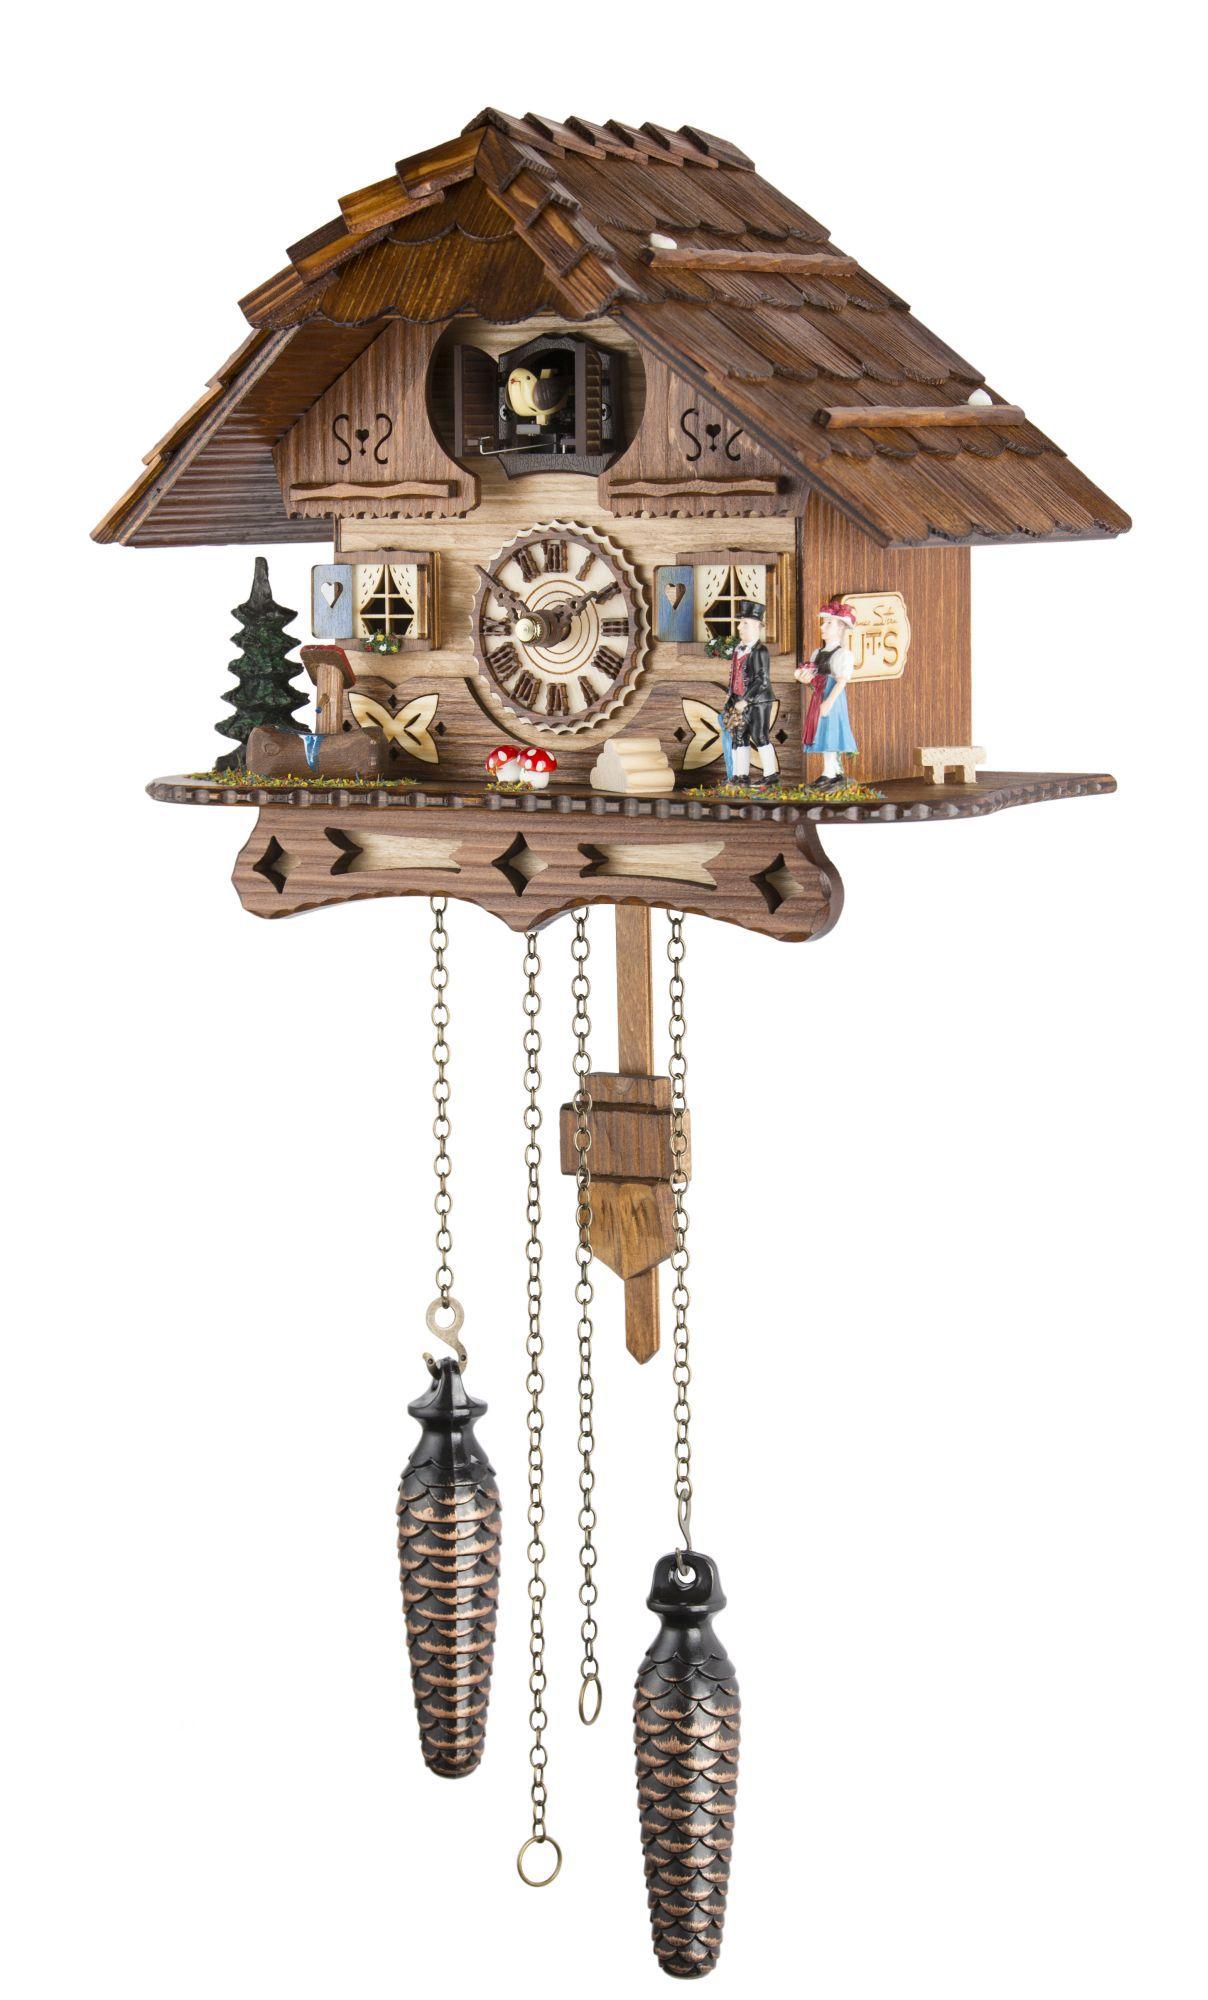 Часы настенные Часы настенные с кукушкой Tomas Stern 5028 chasy-nastennye-s-kukushkoy-tomas-stern-5028-germaniya.jpg